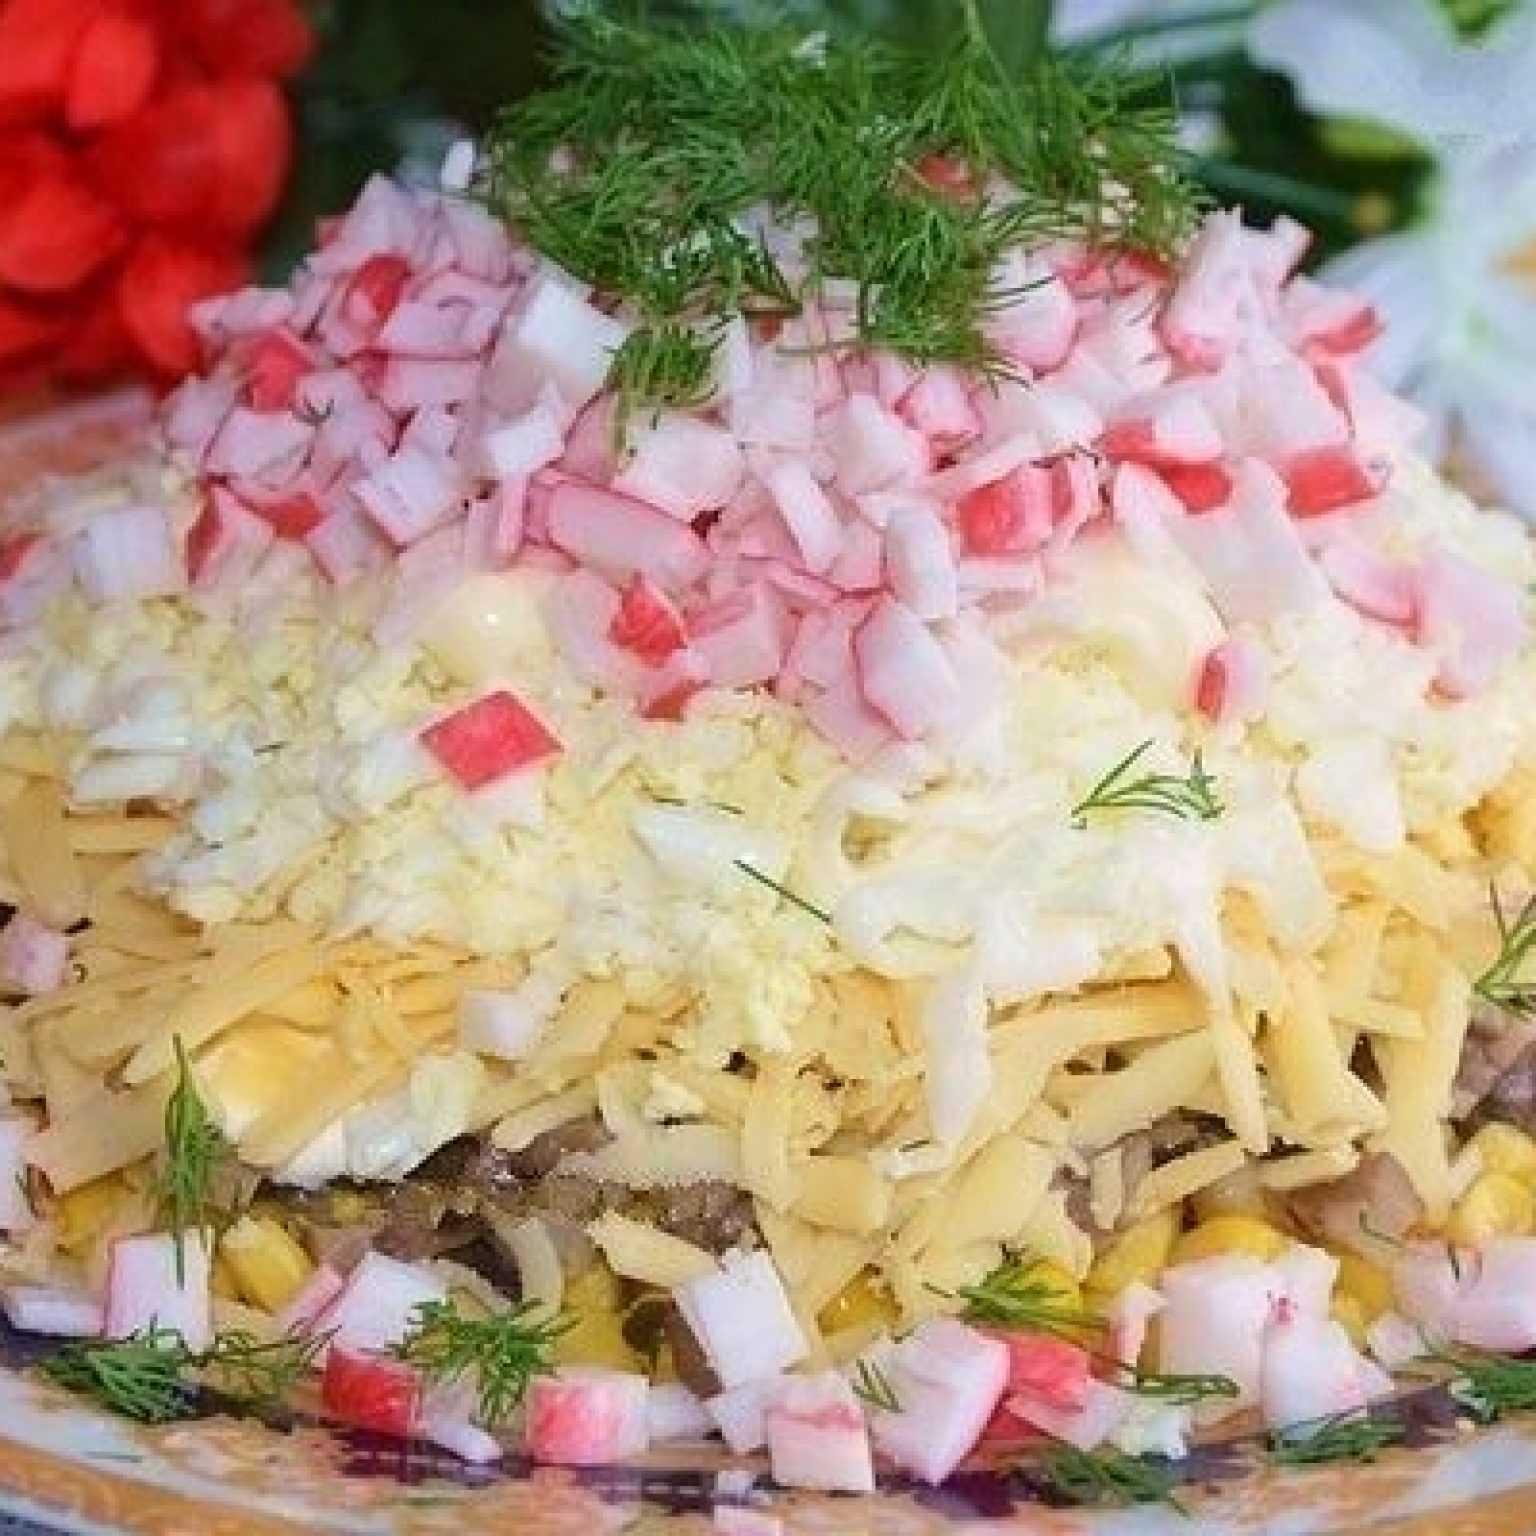 Салат с крабовыми палочками и рисом - от классики до экзотики: рецепт с фото и видео